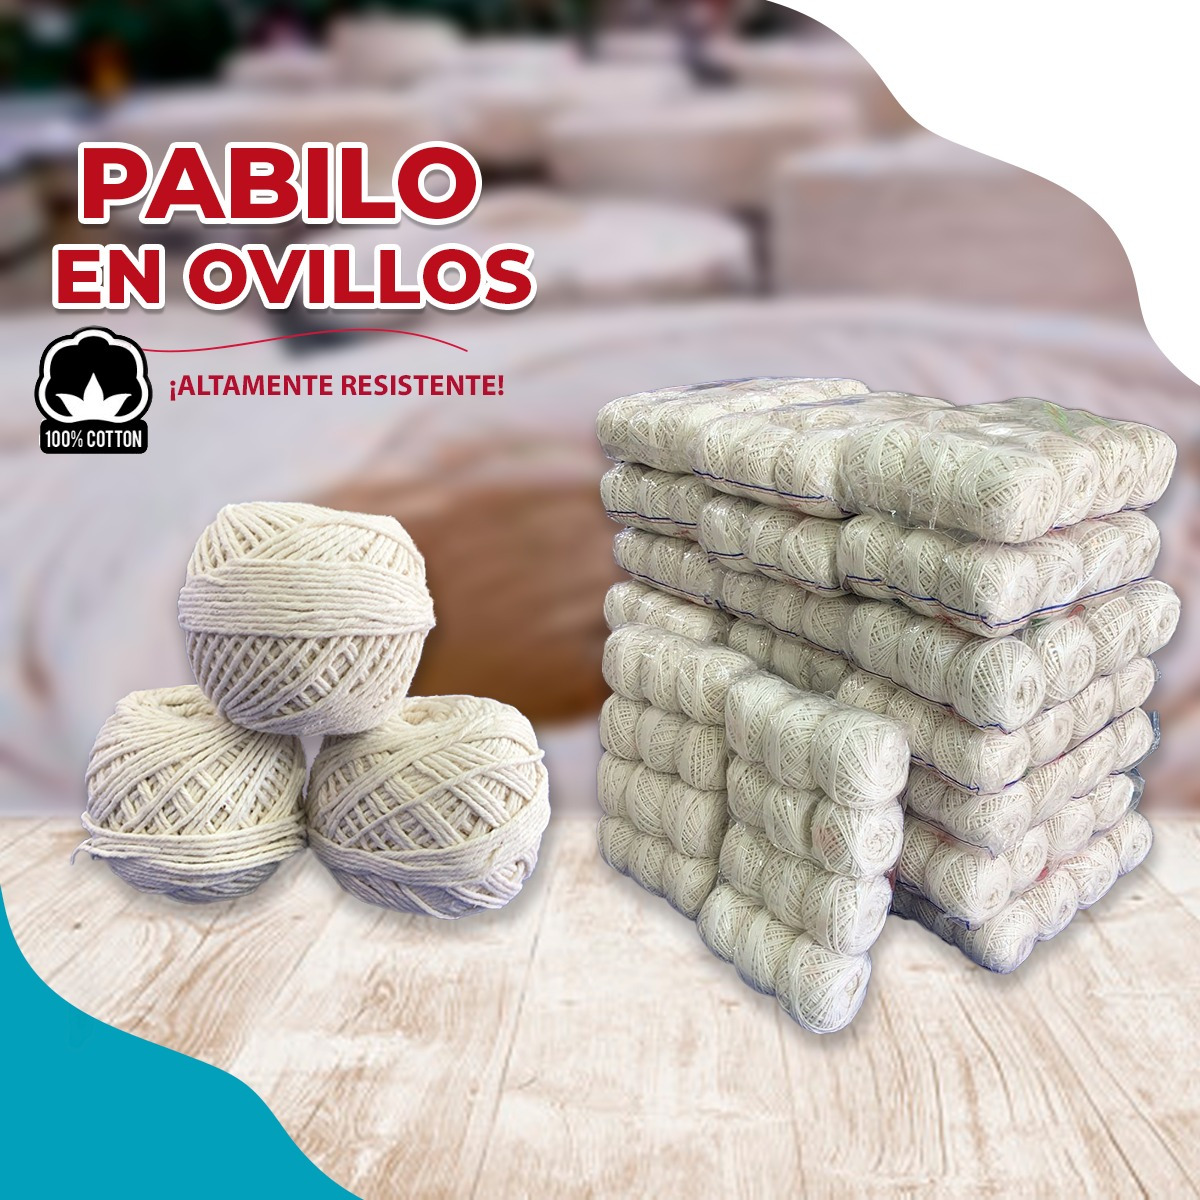 pack de pabilos de algodón en ovillo